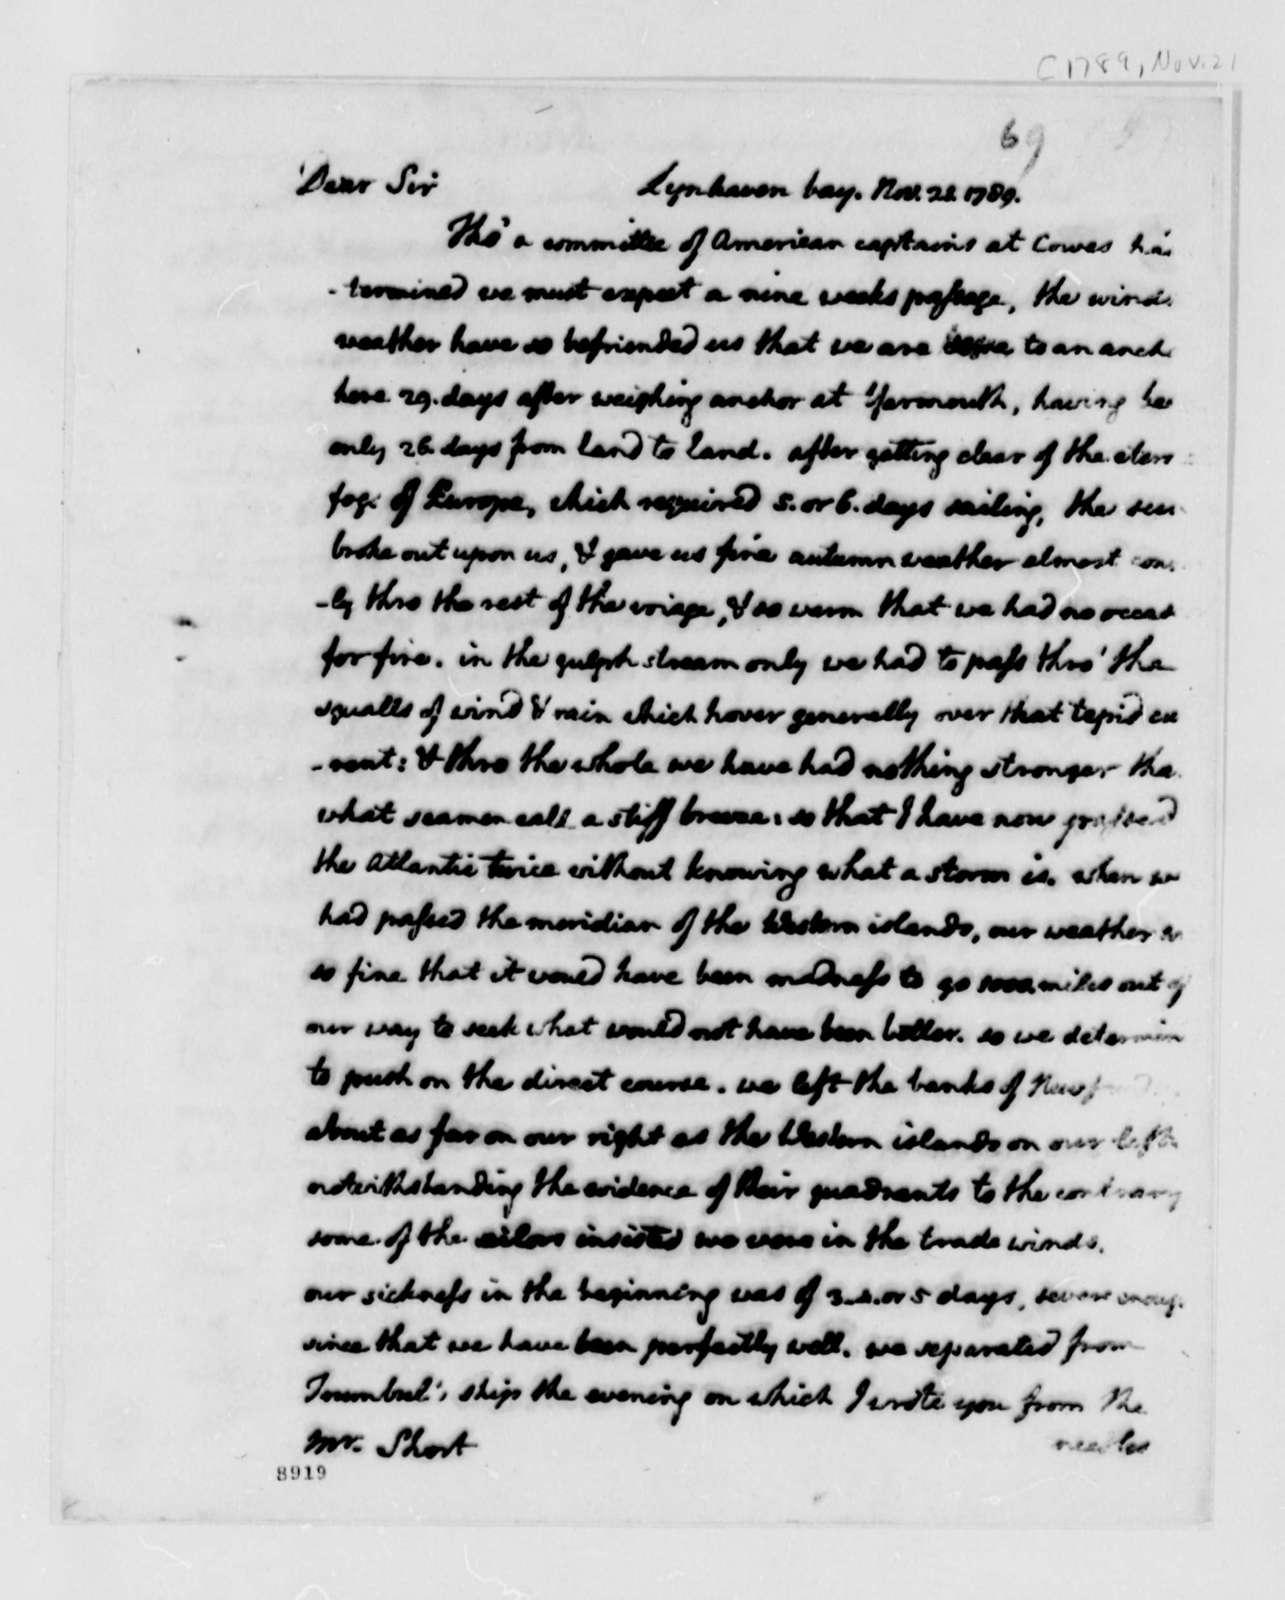 Thomas Jefferson to William Short, November 21, 1789